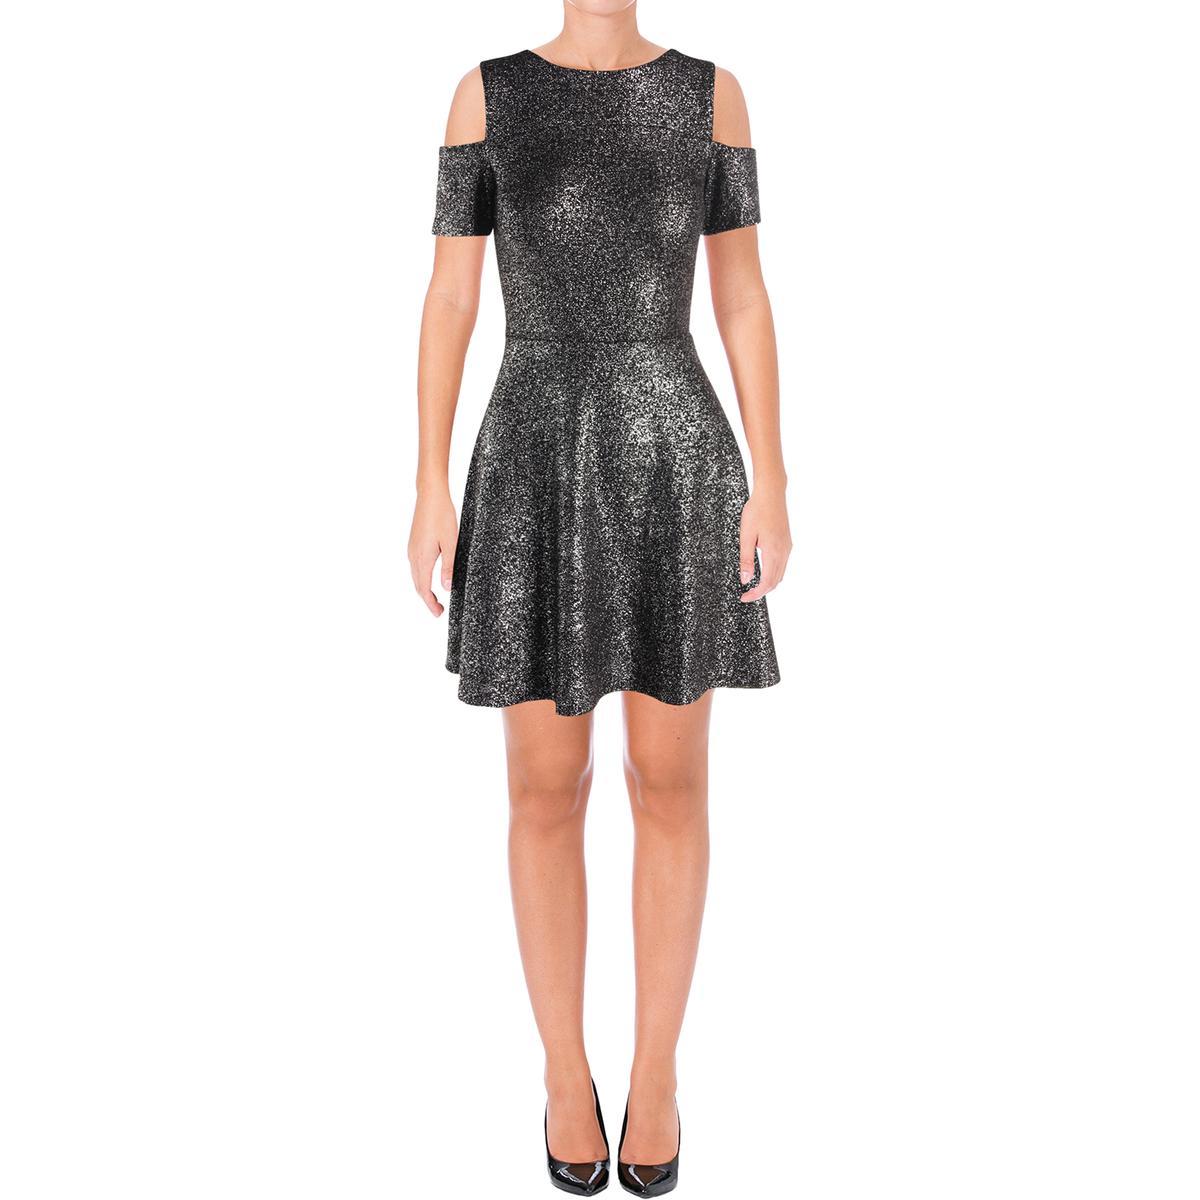 Aqua Womens Splatter Cold Shoulder Above Knee Party Clubwear Dress BHFO 7587